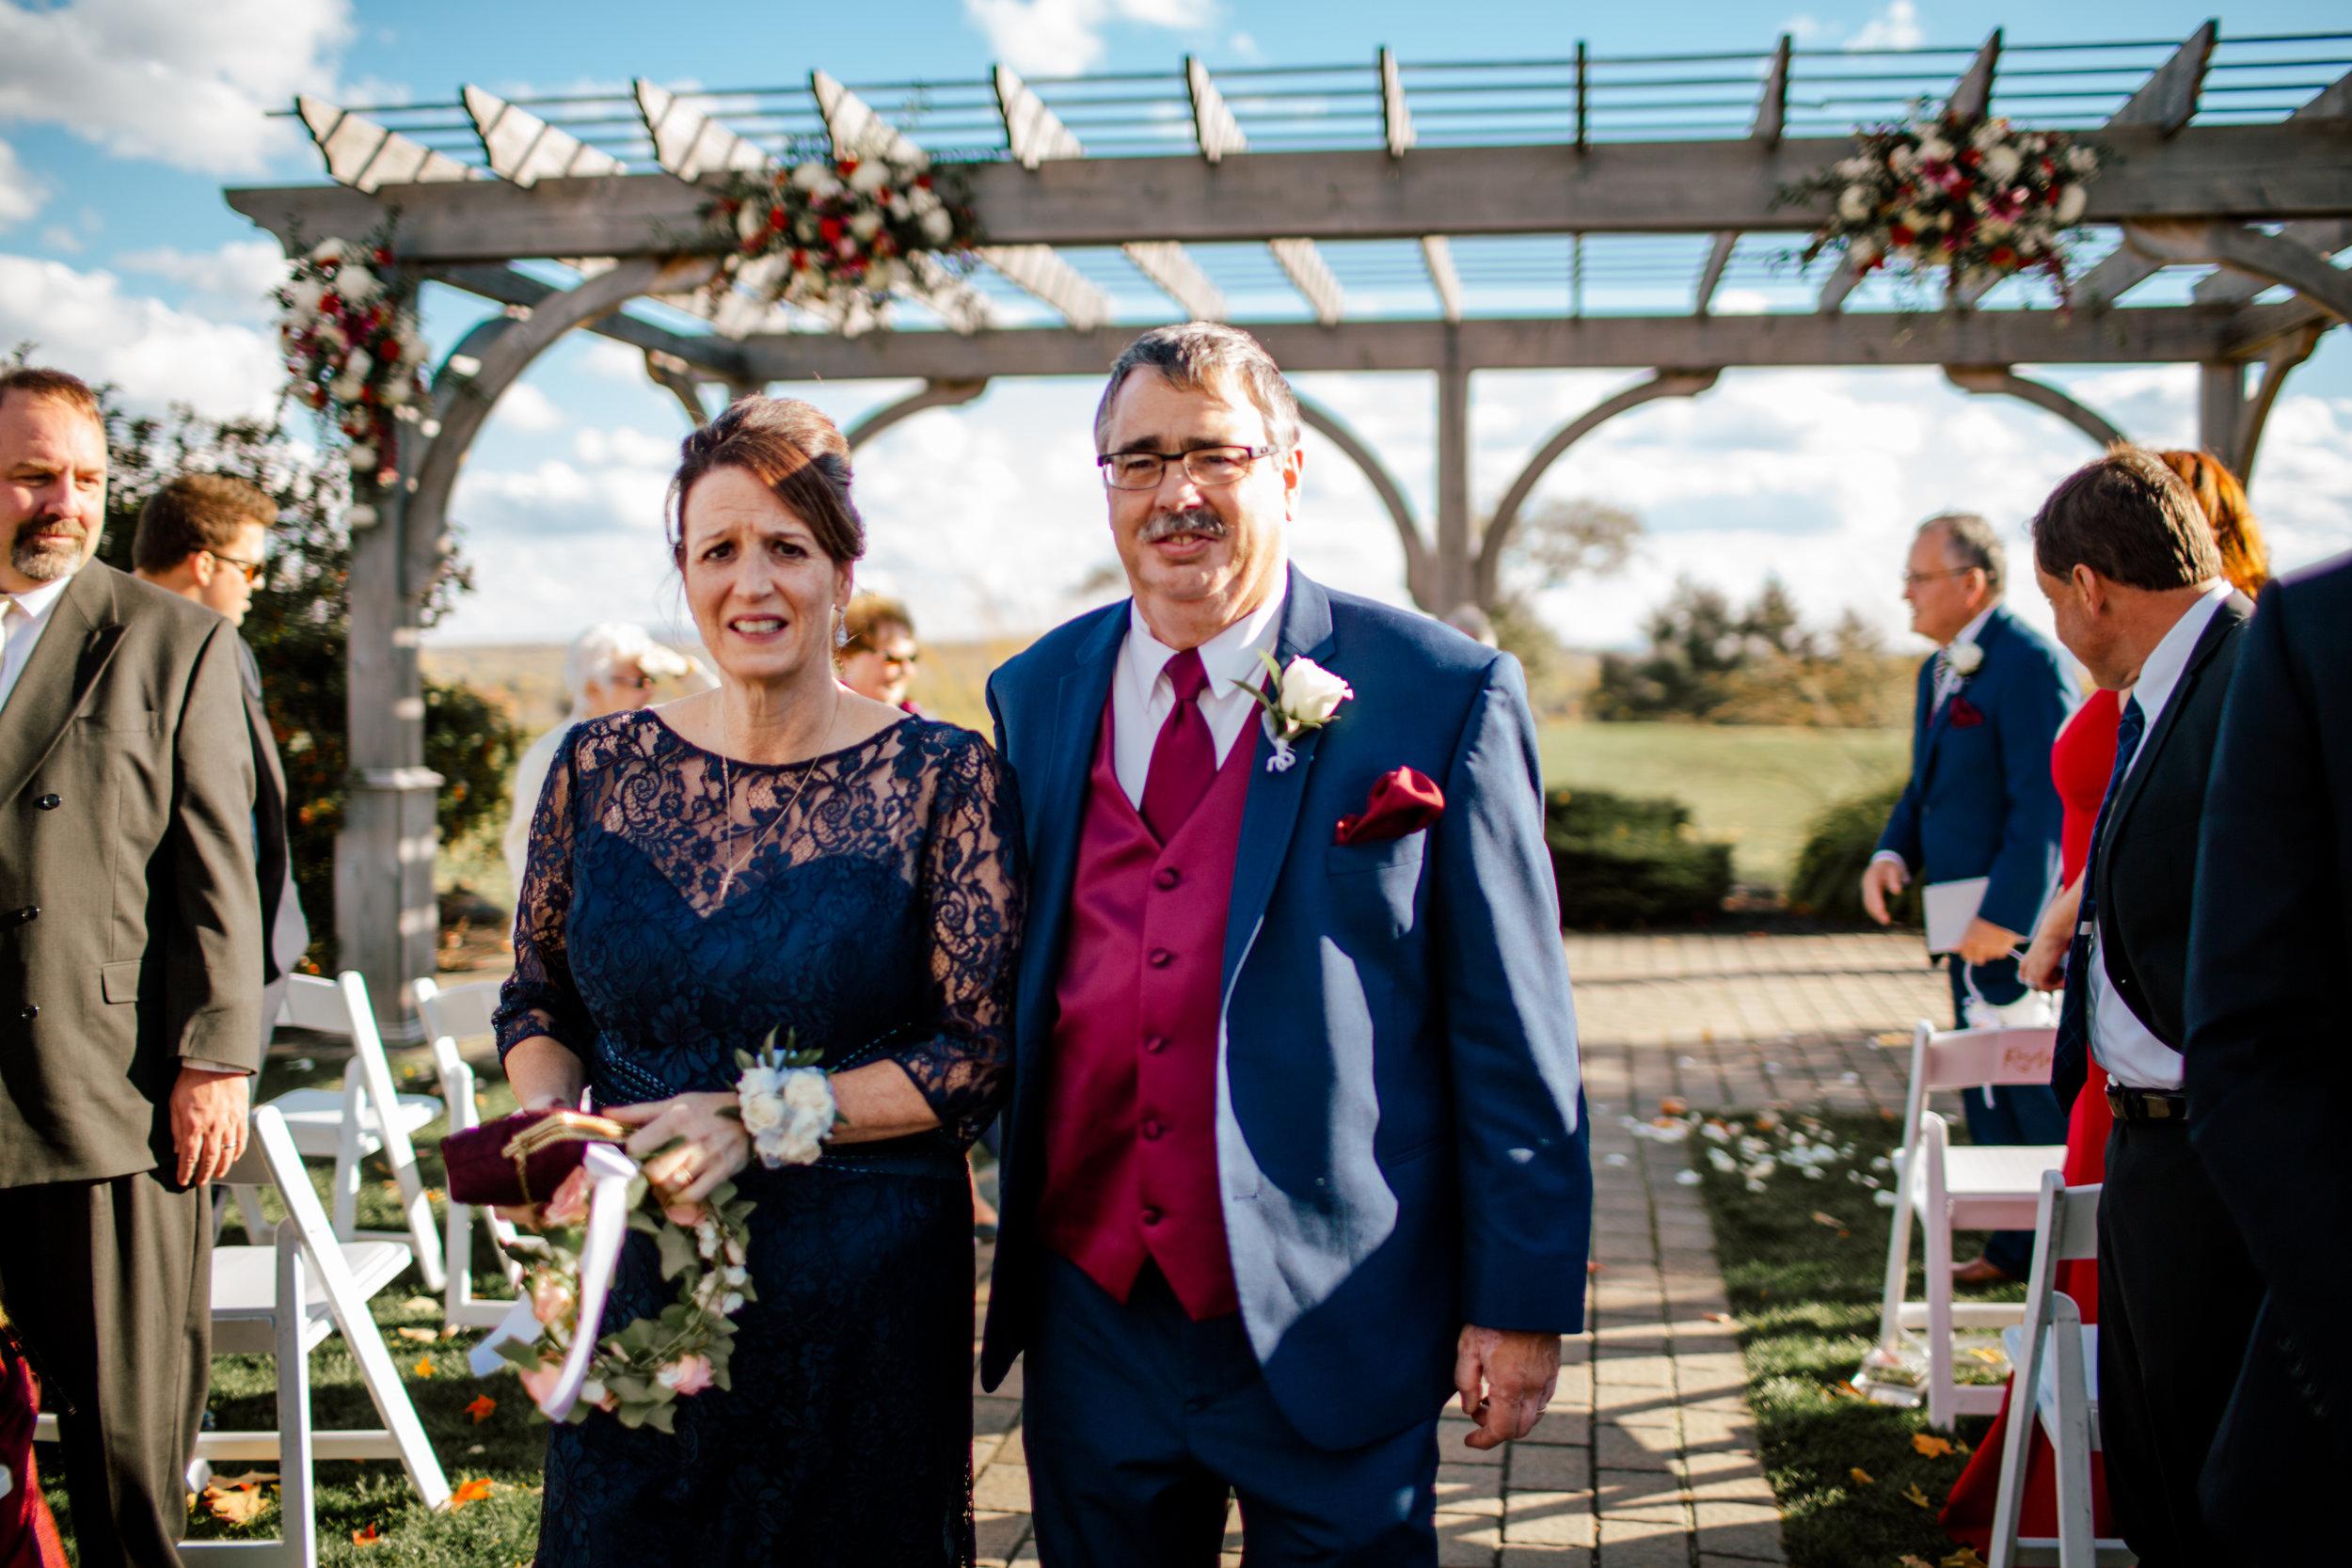 Jeff-and-Leslie-Wedding -8145.jpg